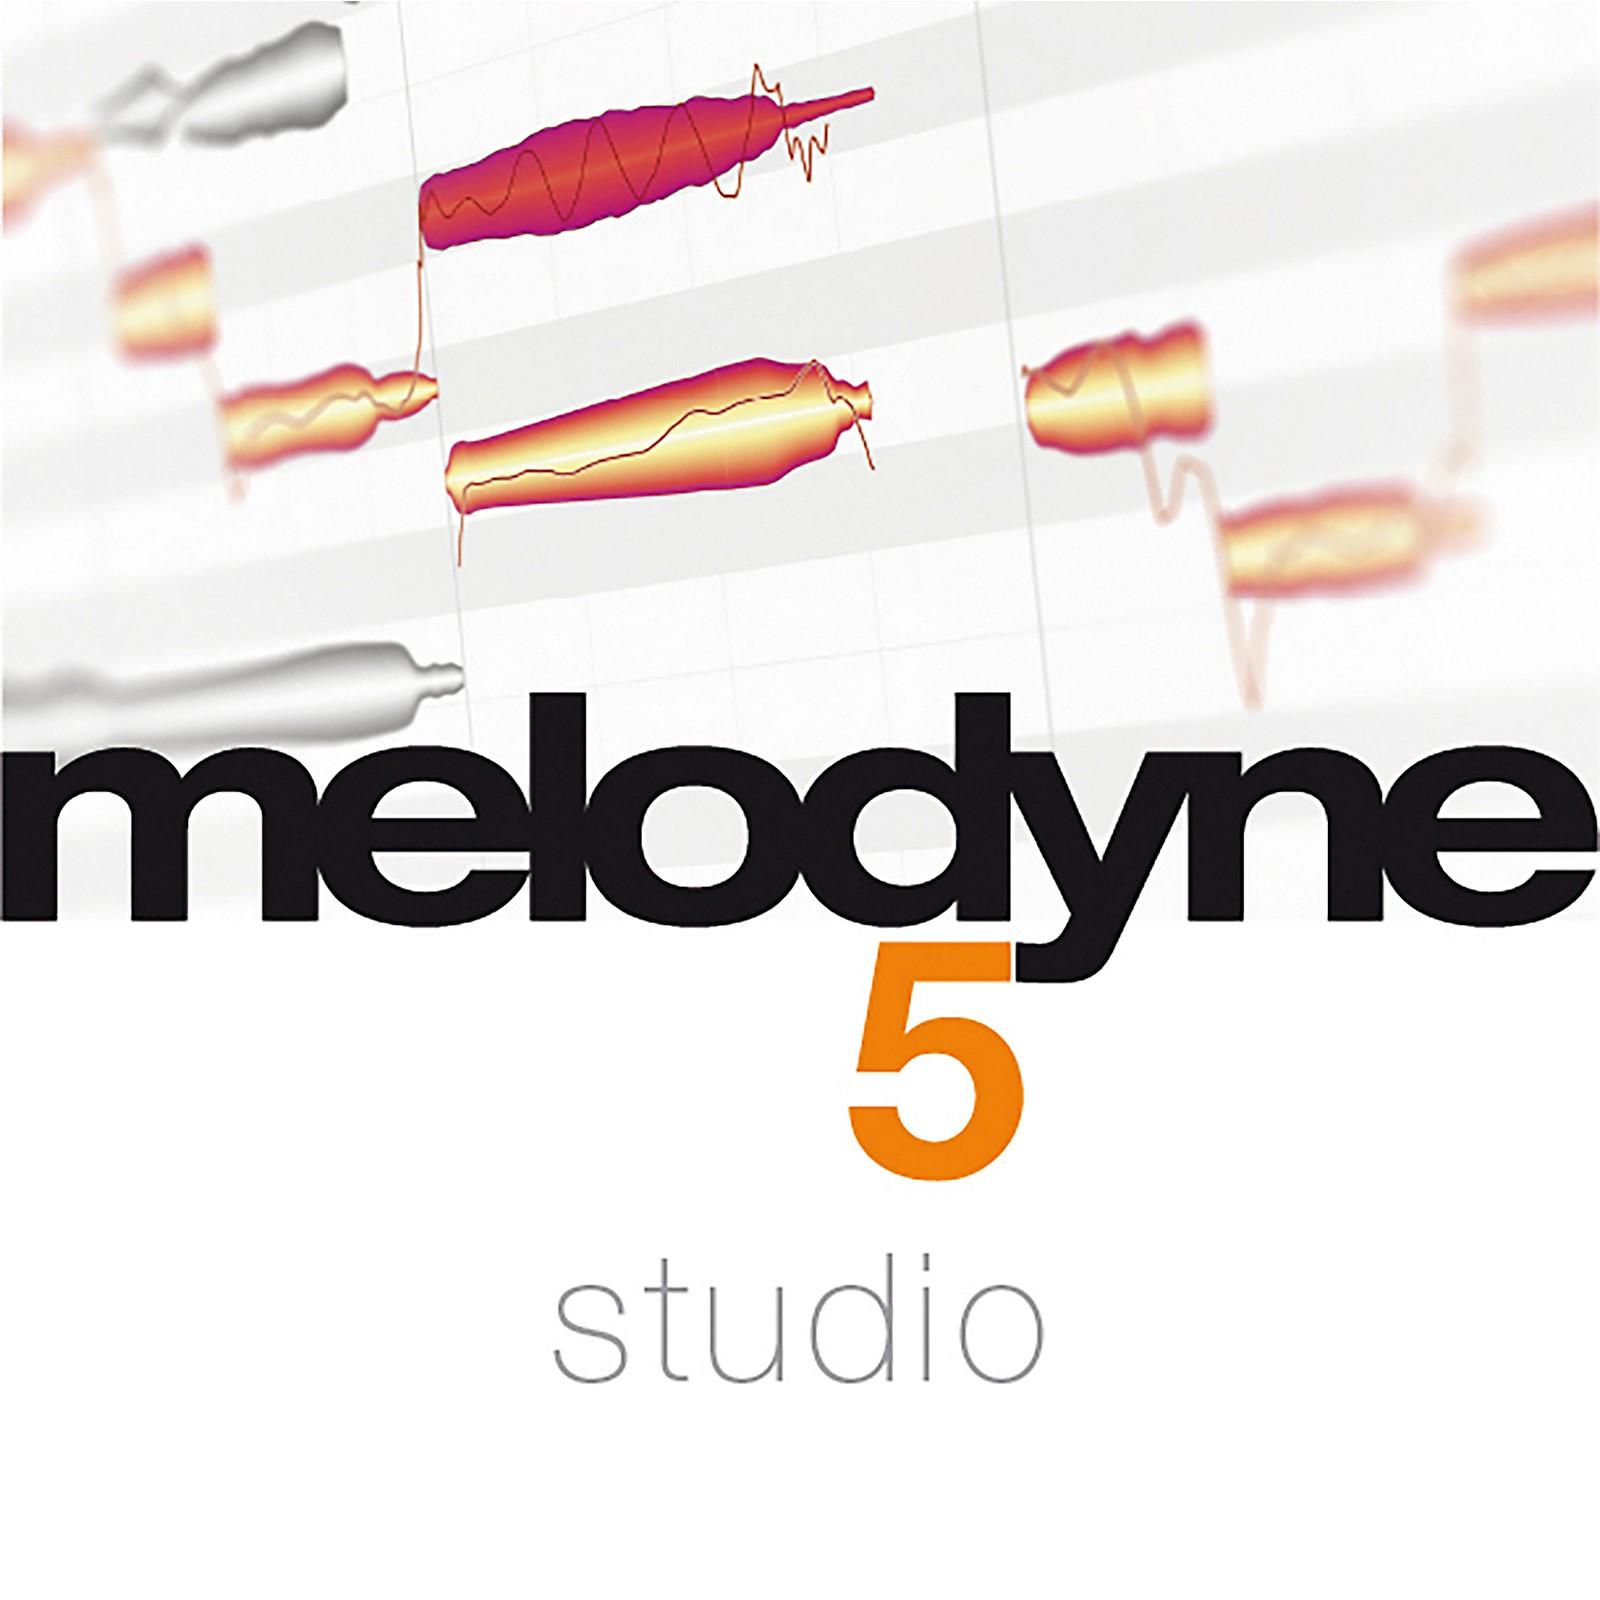 Celemony Melodyne 5 Studio Add-on License (Software Download)